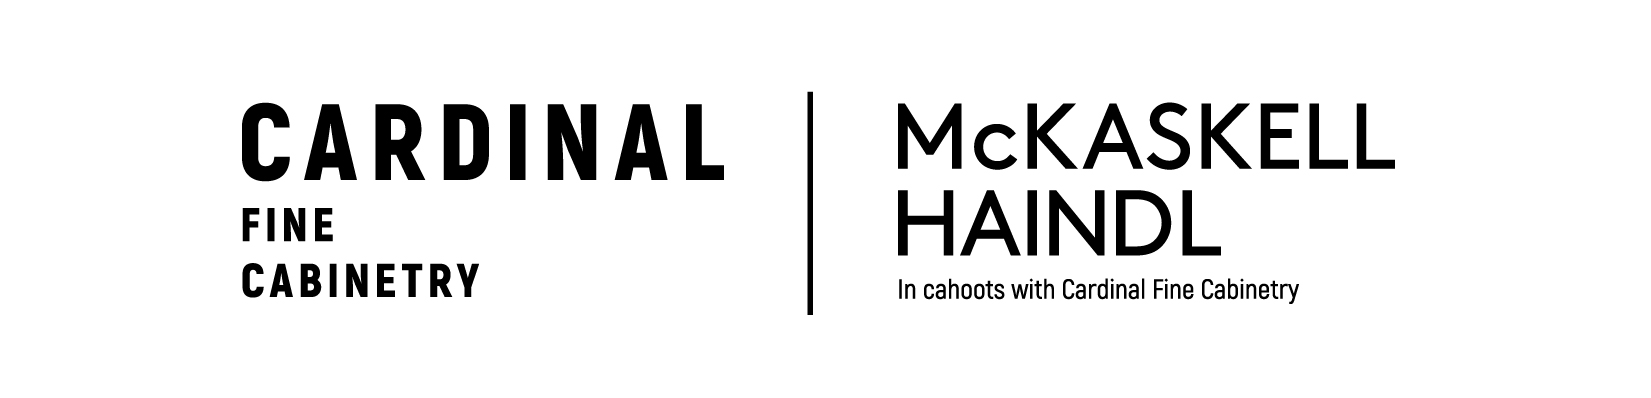 Forest CIty COokbook - McKaskell Haindl-01.jpg